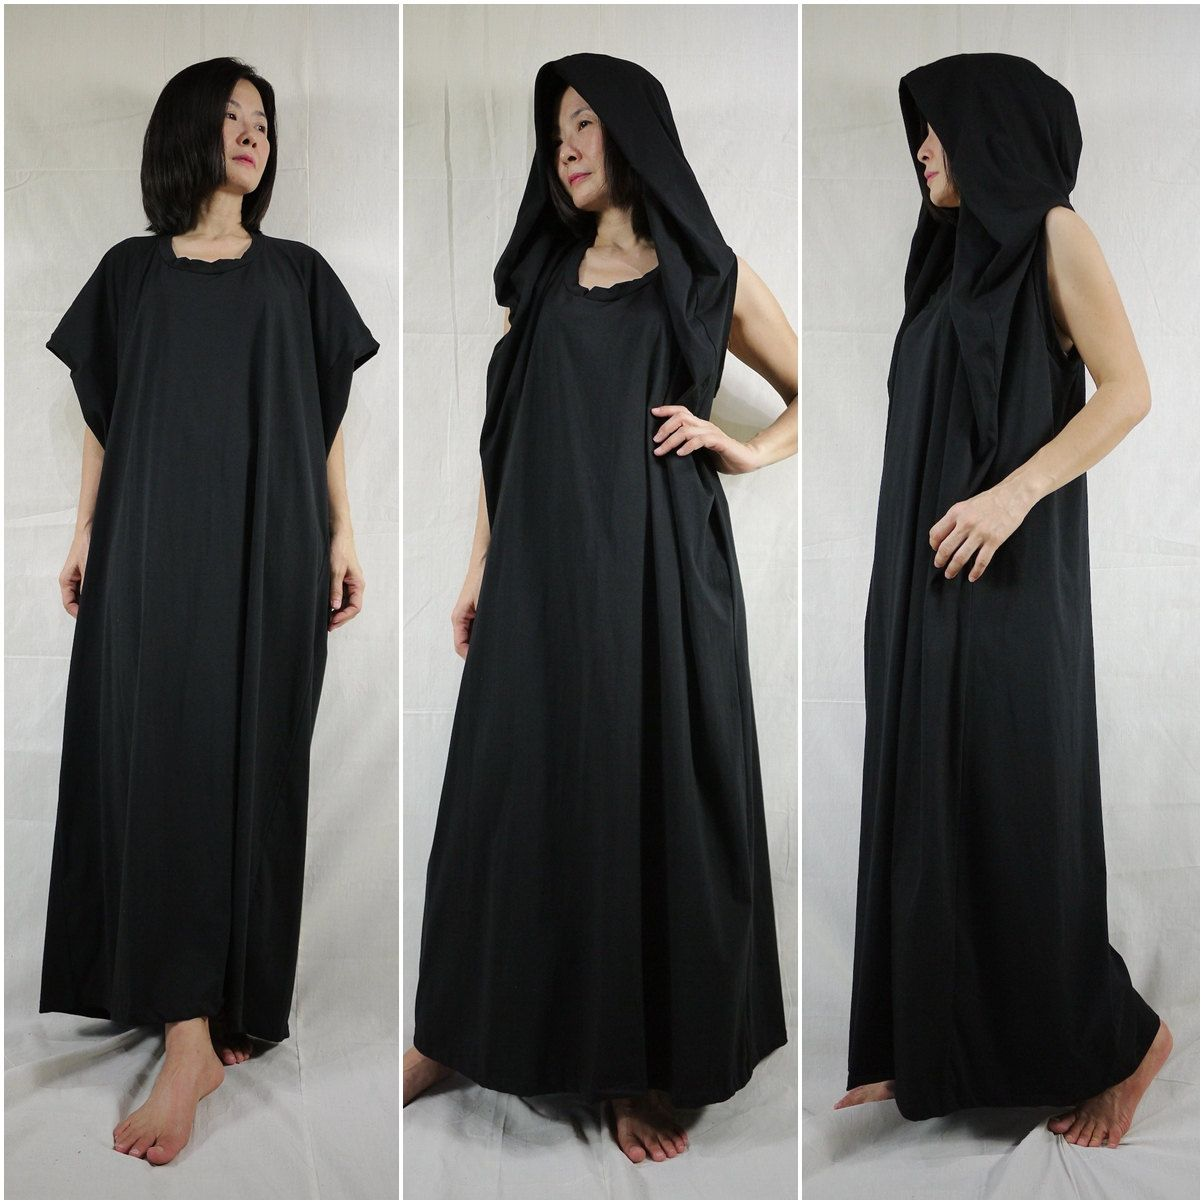 Funky Oversize Hood Cape Maxi Black Cotton Jersey Dress by